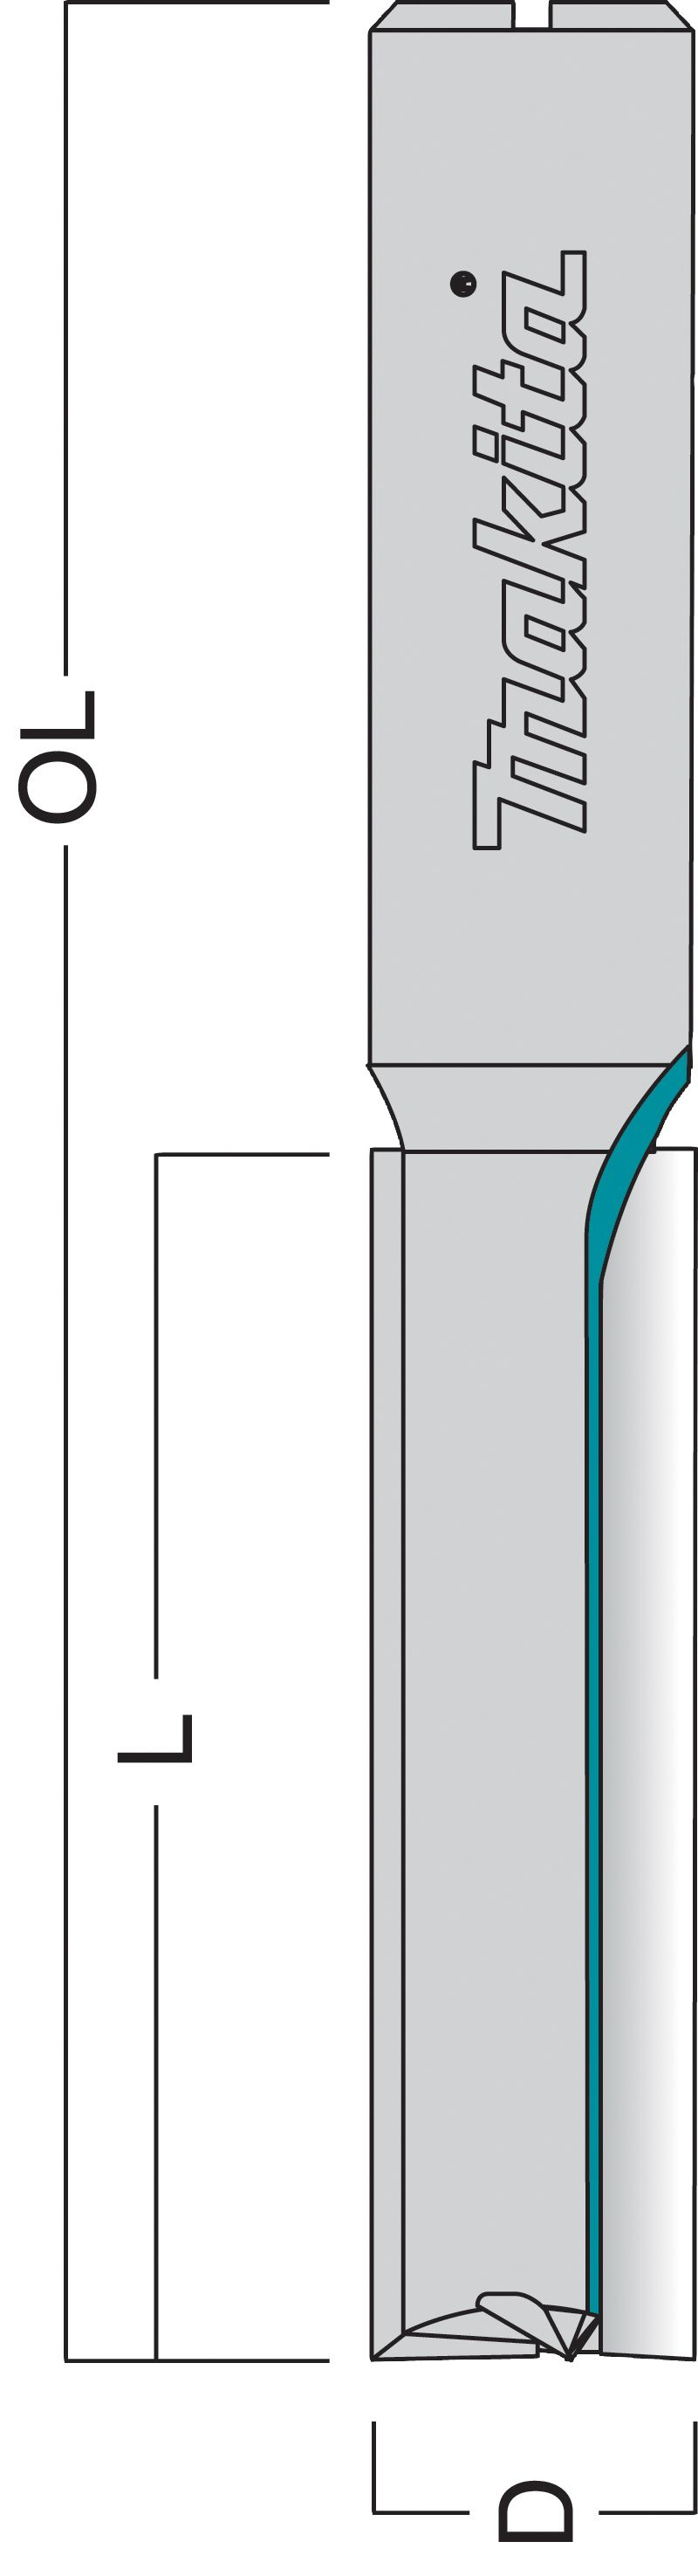 "Makita Straight Worktop Cutter 1/2"" Shank 12.7x50mm"